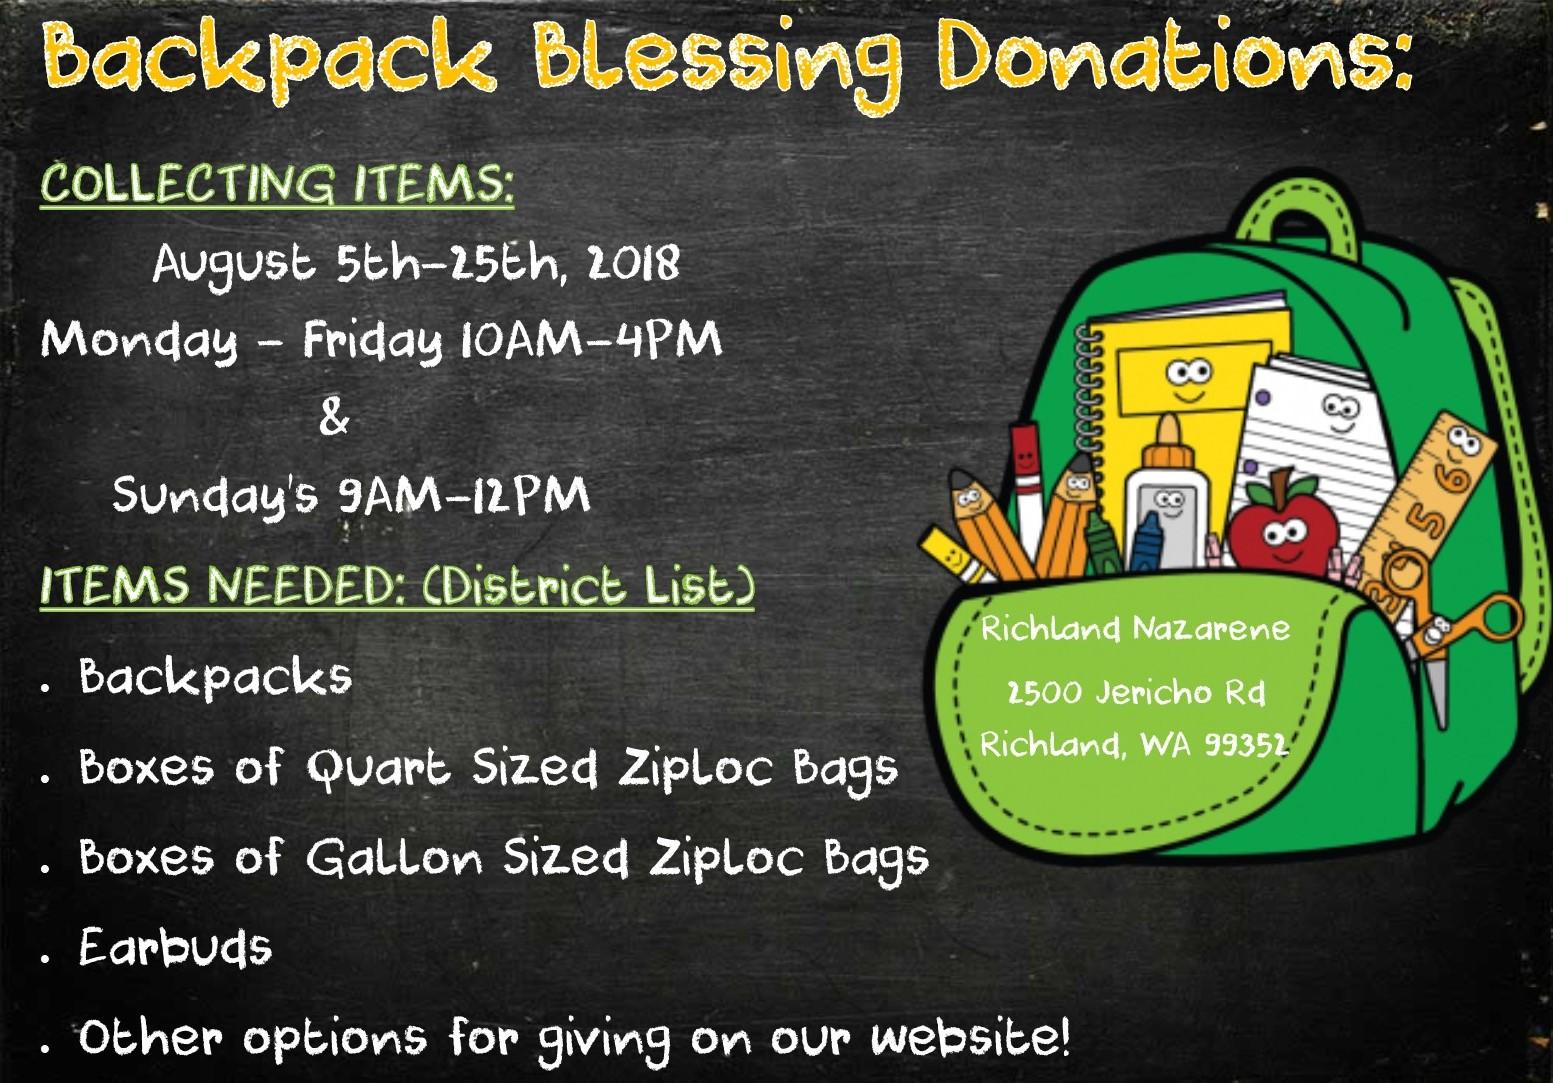 Backpack Blessing Donations.jpg